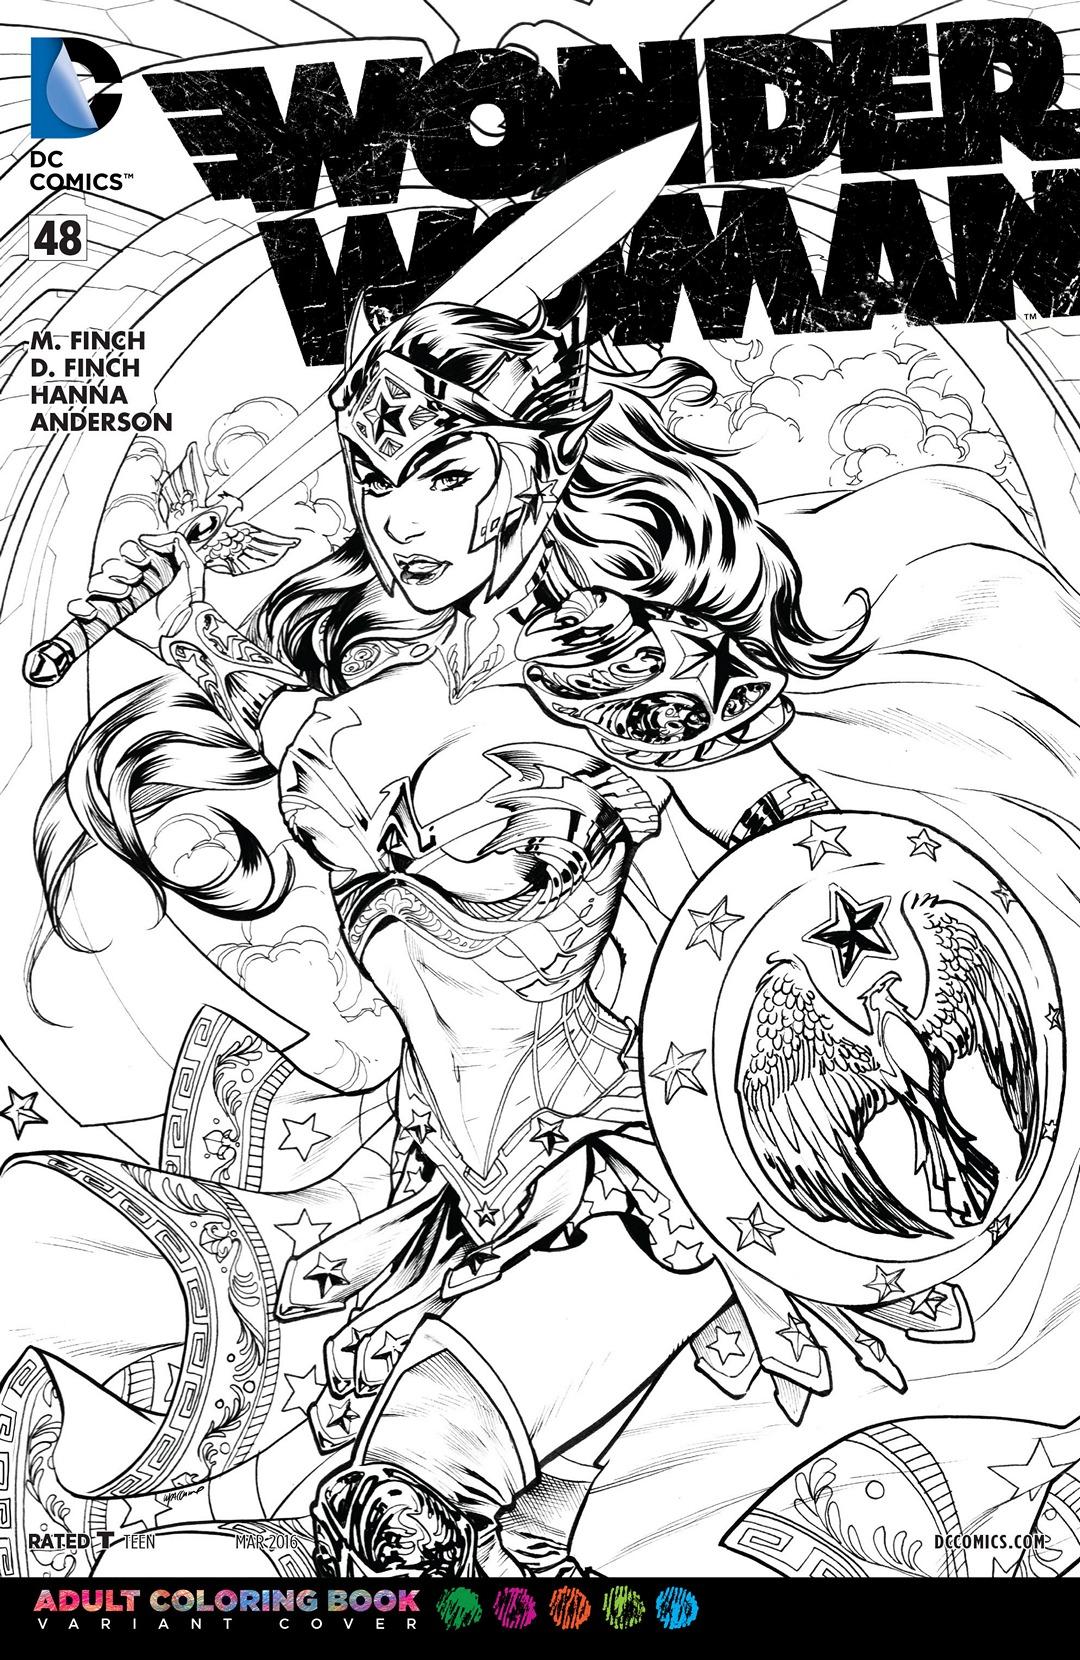 image wonder woman vol 4 48 adult coloring book variantjpg dc database fandom powered by wikia - Wonder Woman Coloring Book